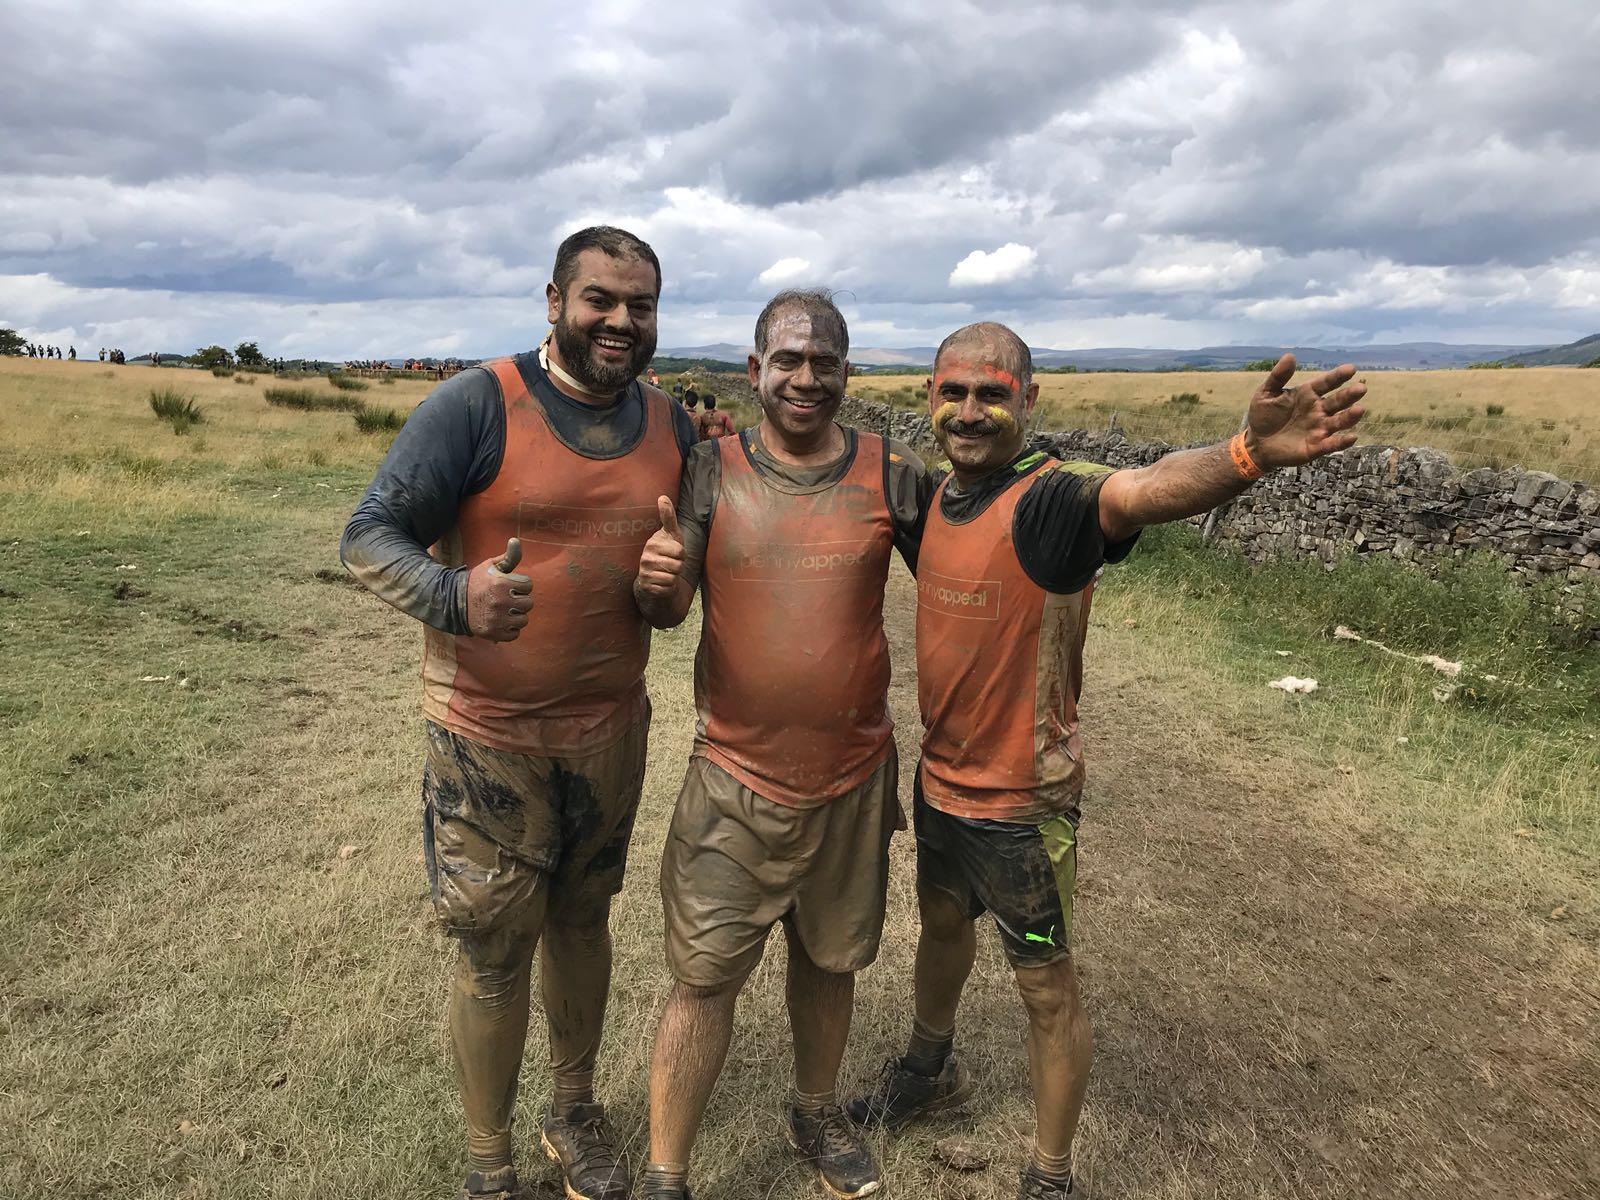 tough mudder boots and beards44.jpeg